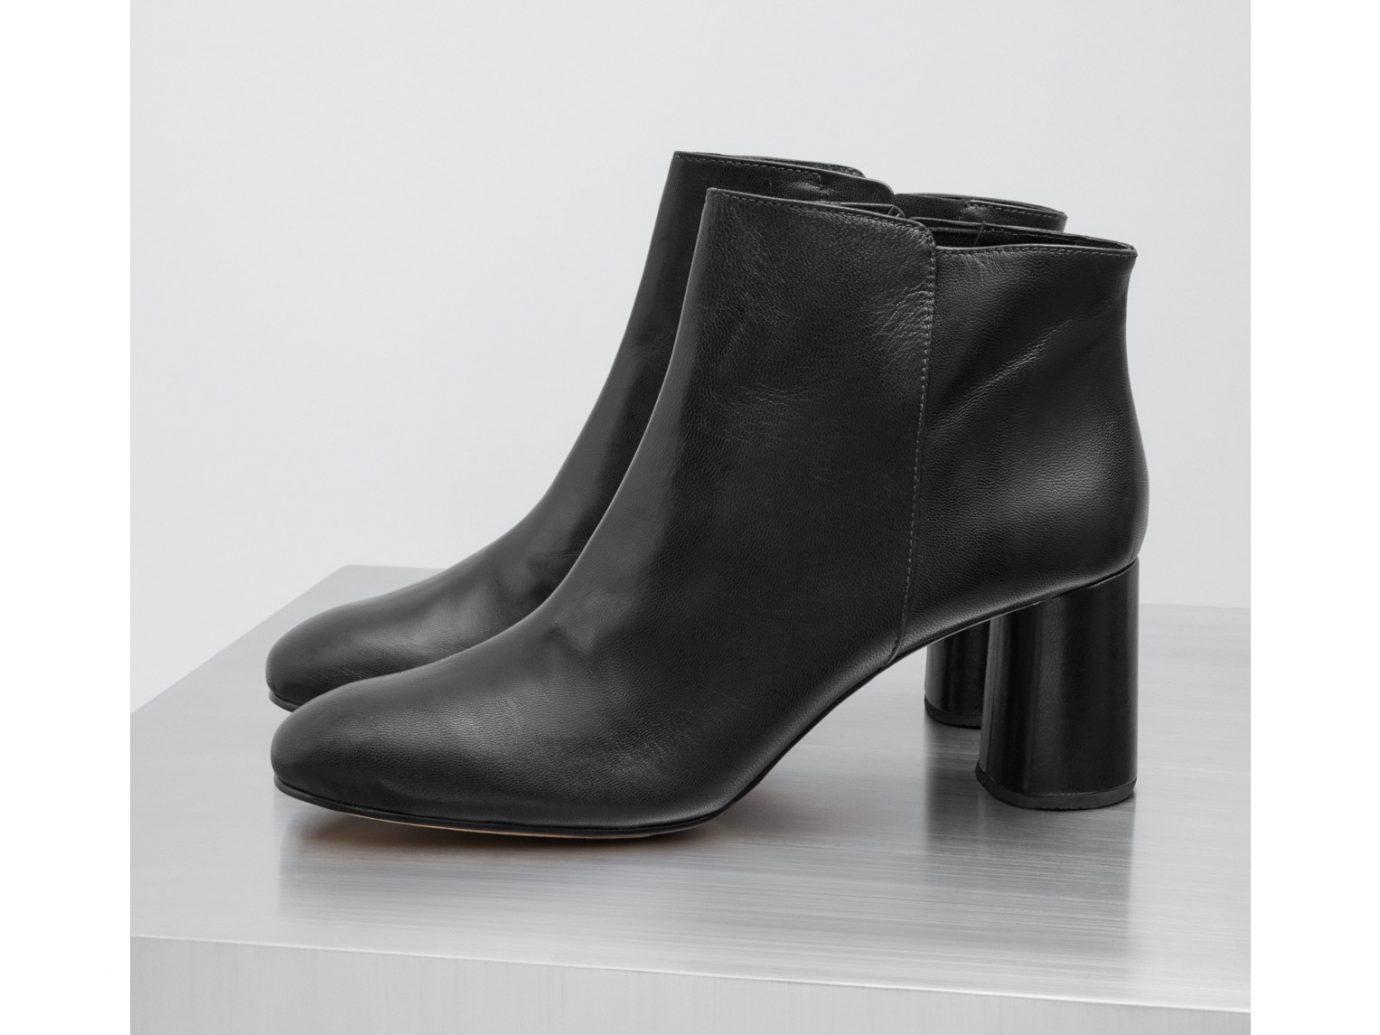 RACHEL COMEY Lin boots